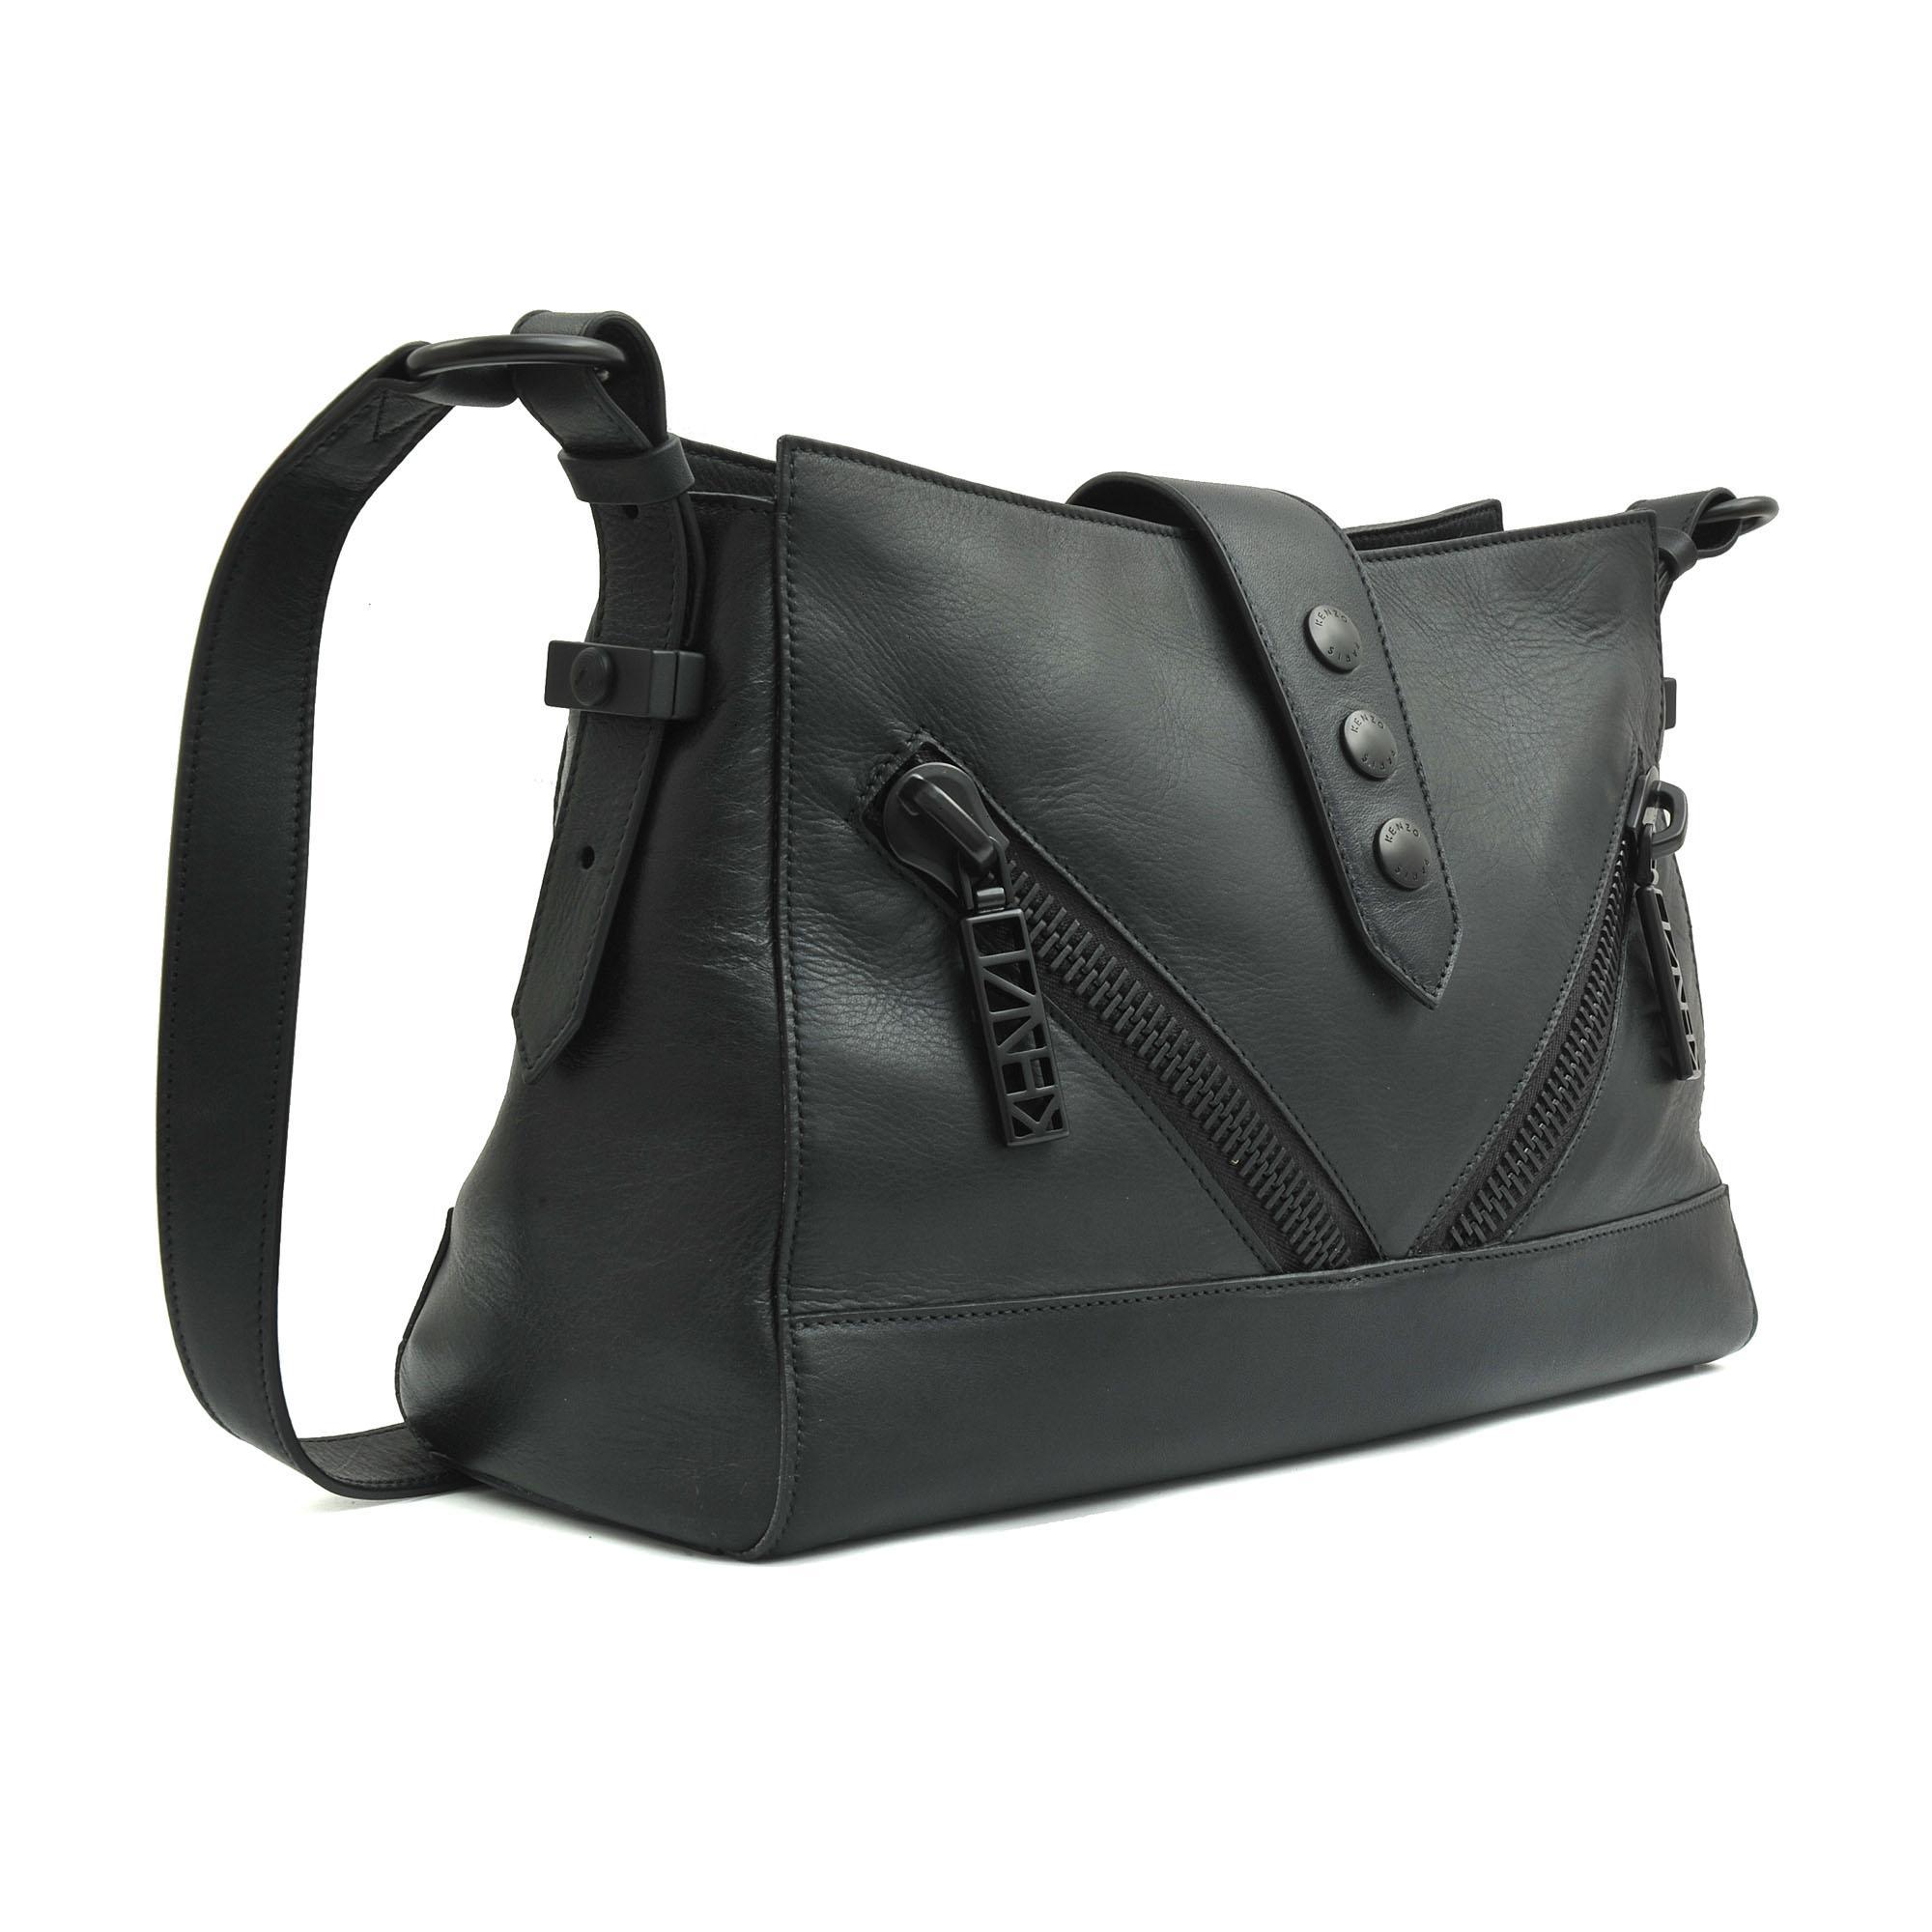 096135f6c1 KENZO Kalifornia Bag in Black - Lyst